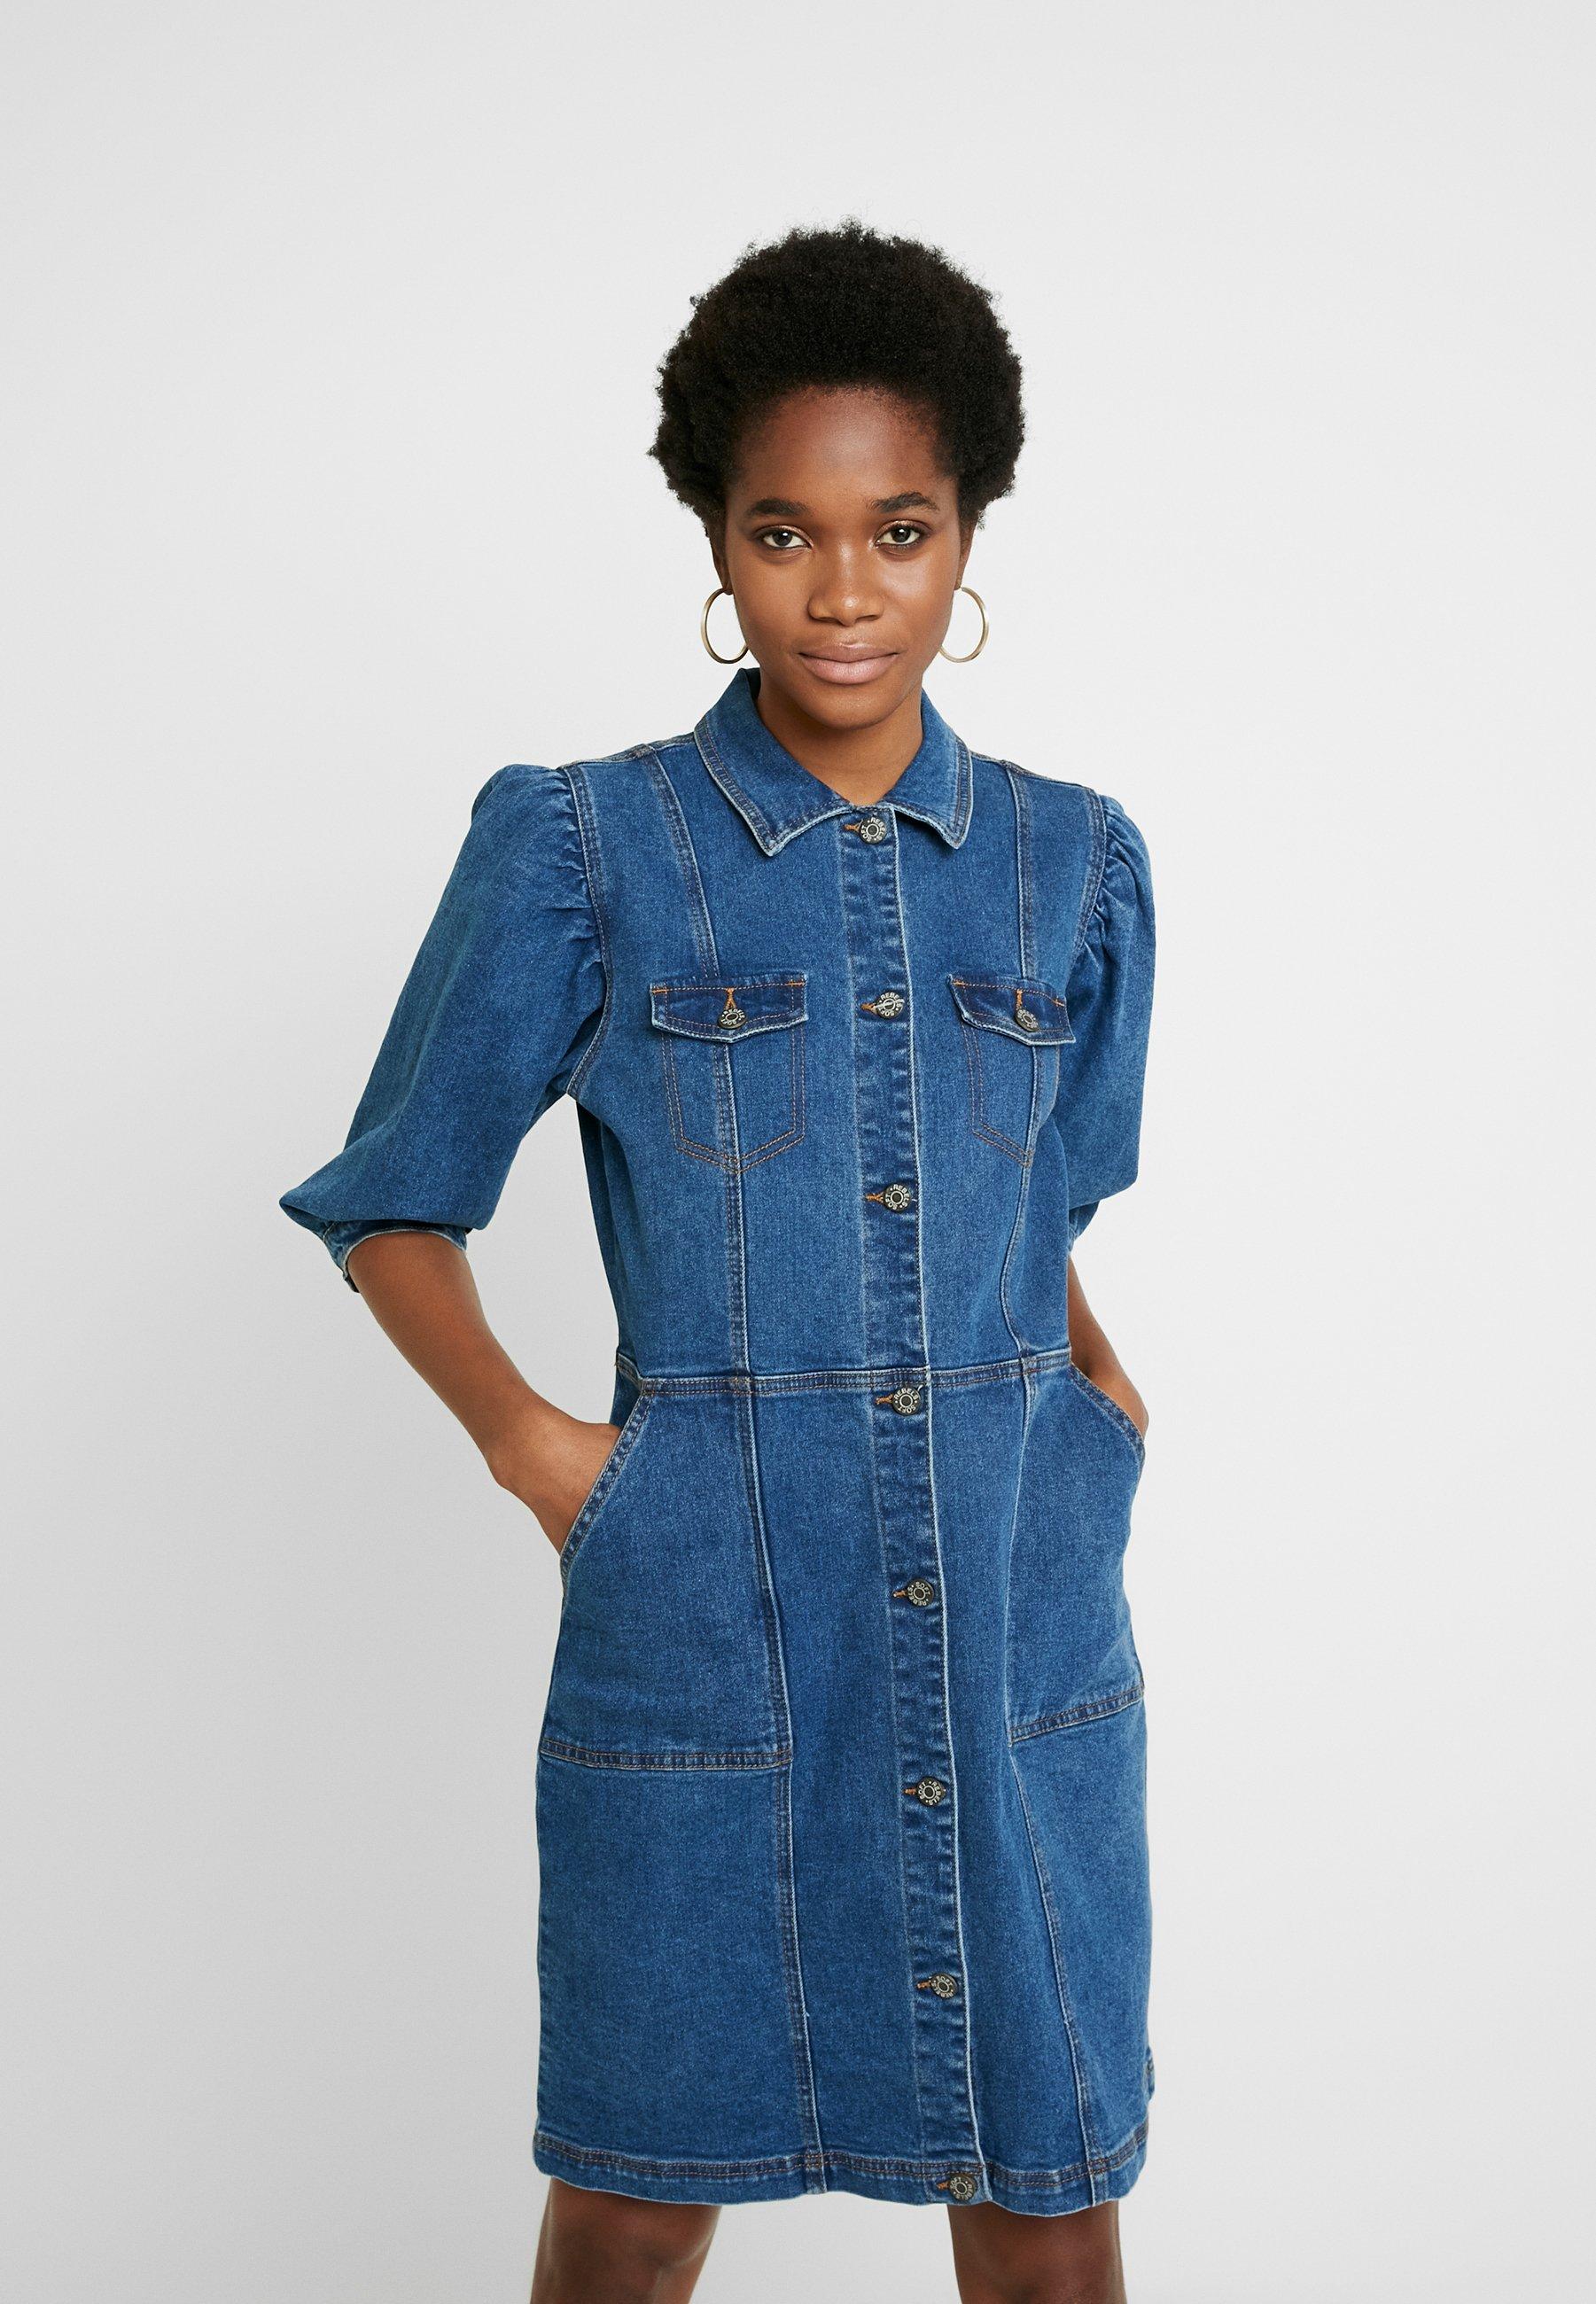 jean dress,blue jean dress,